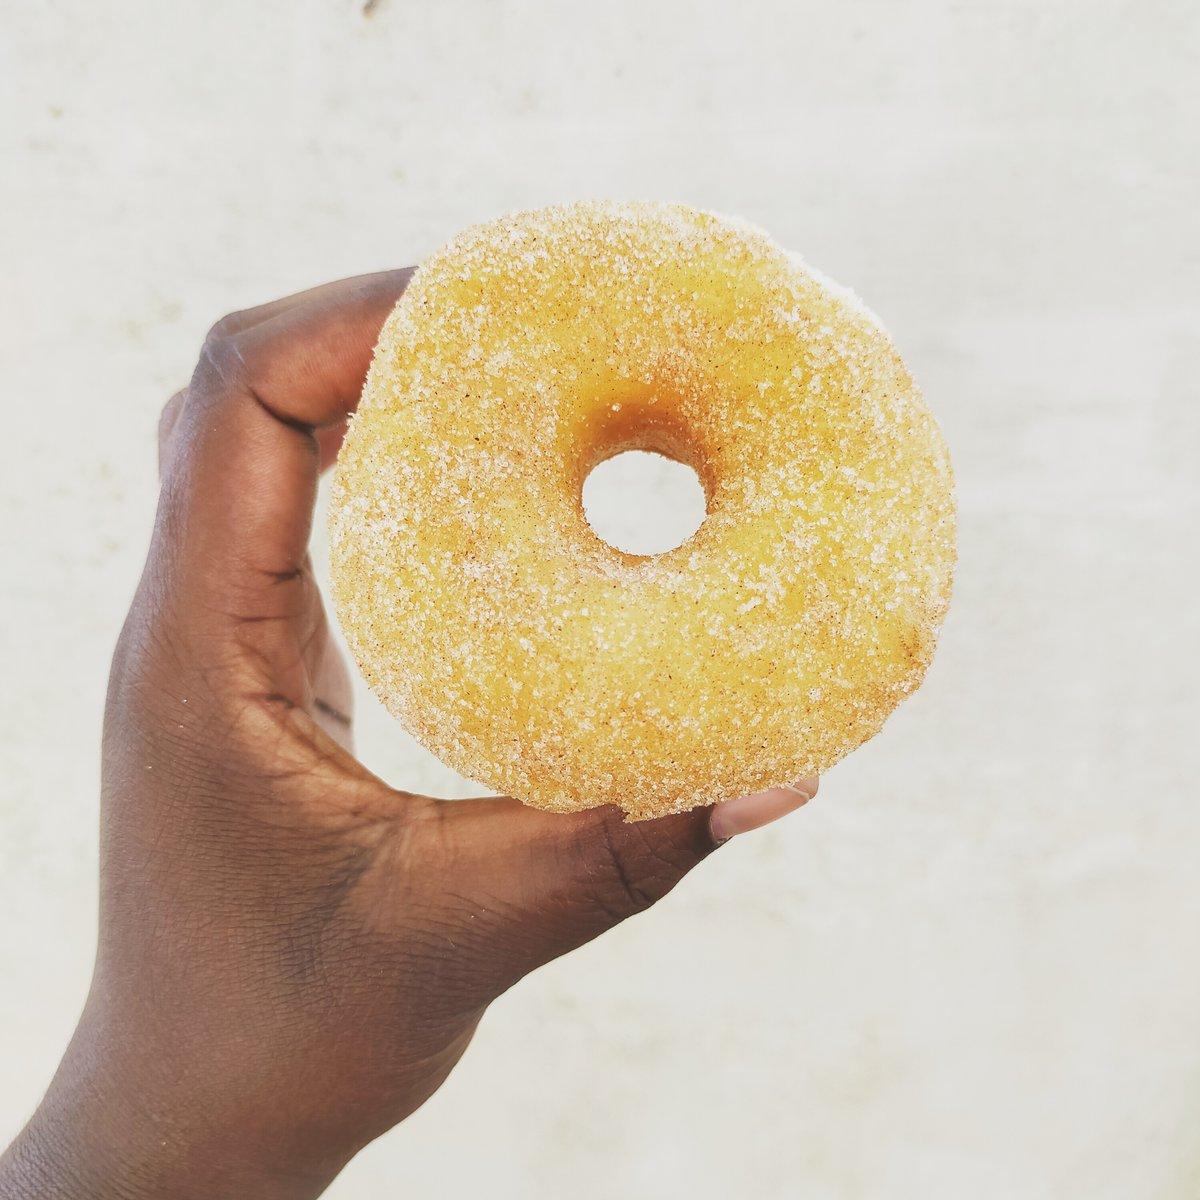 Image of El churro donut